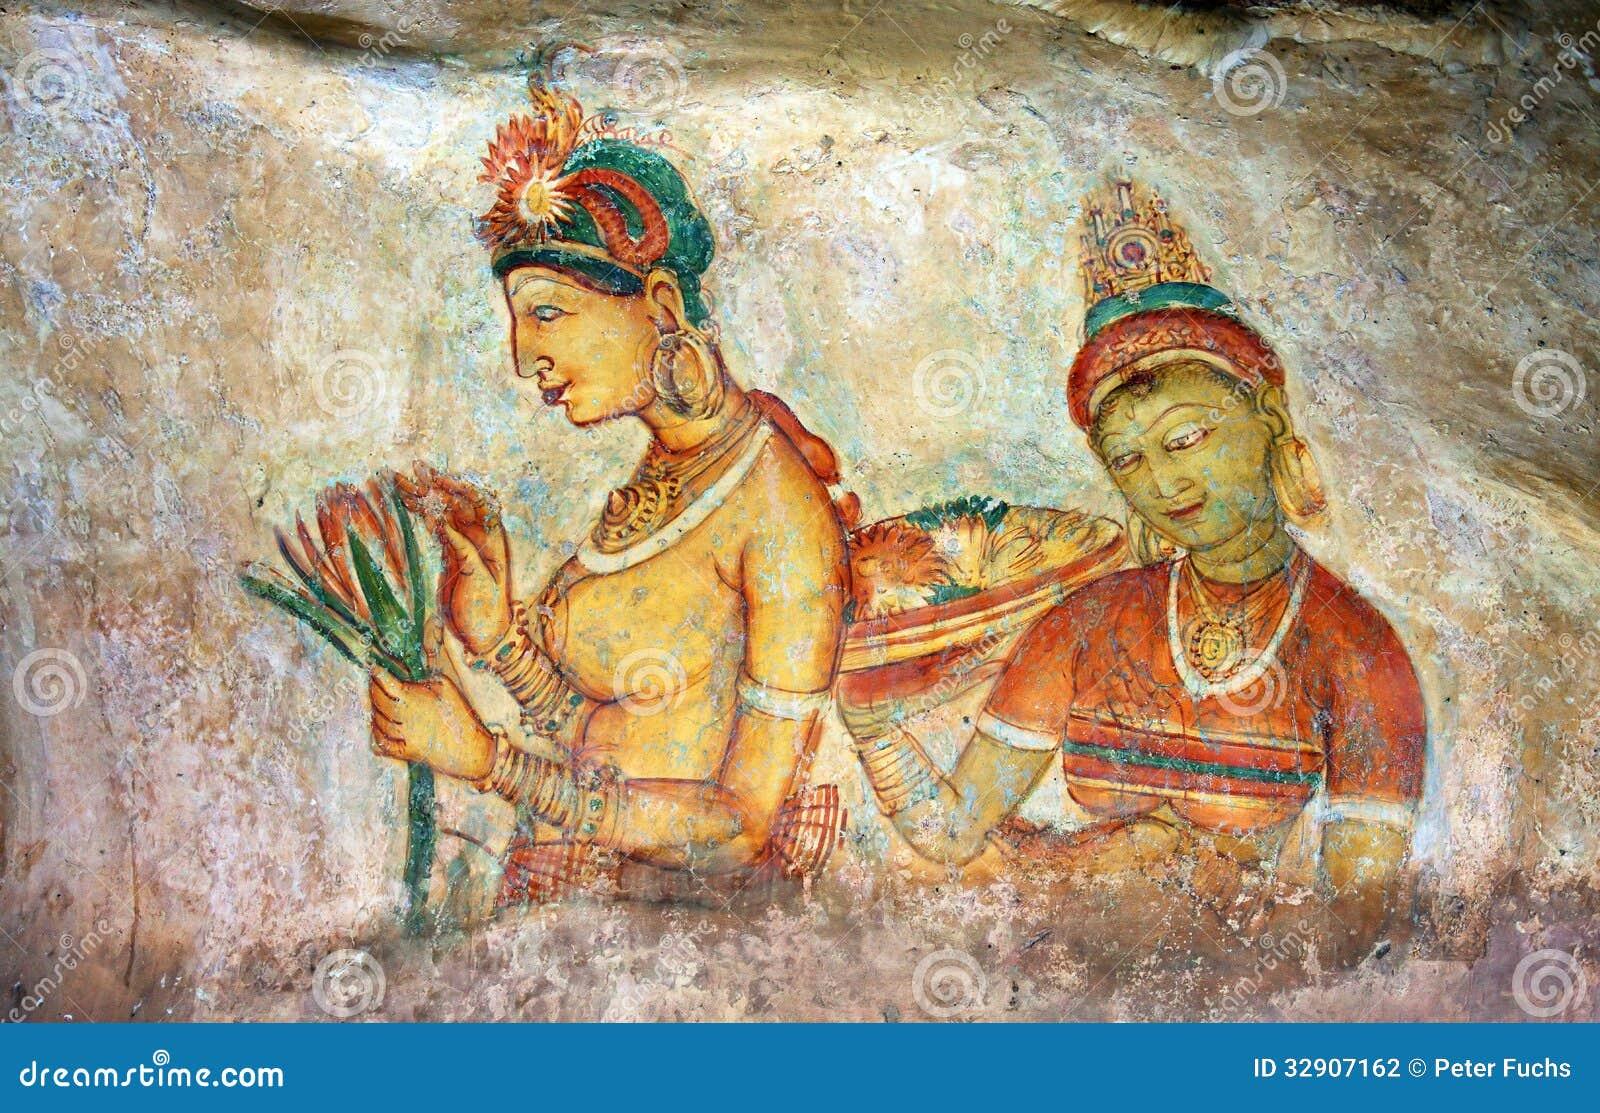 Sigiriya Painting Stock Photography Image 32907162